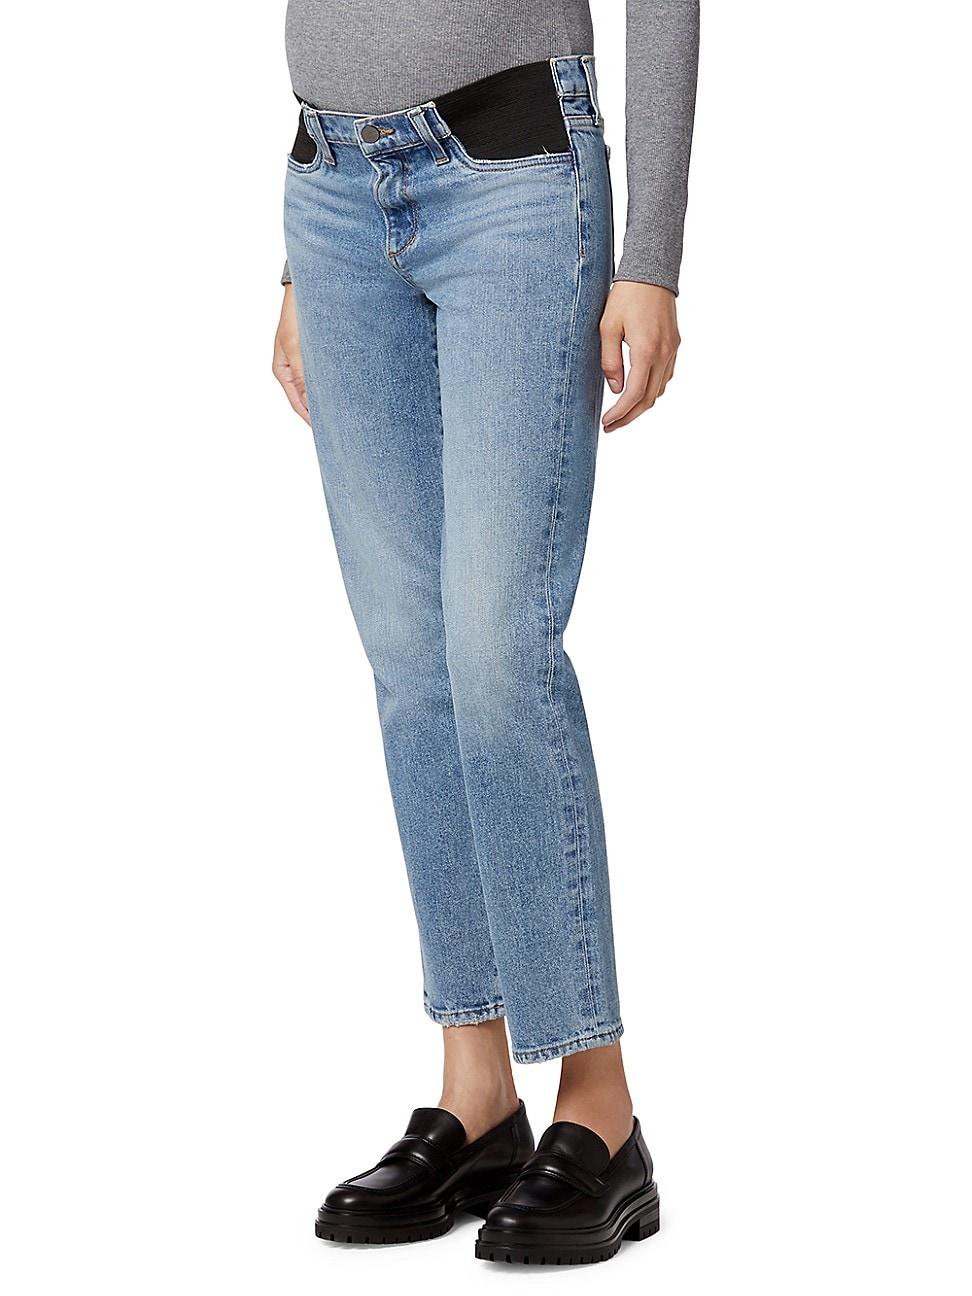 Joe's Jeans WOMEN'S THE LARA ANKLE MATERNITY JEANS